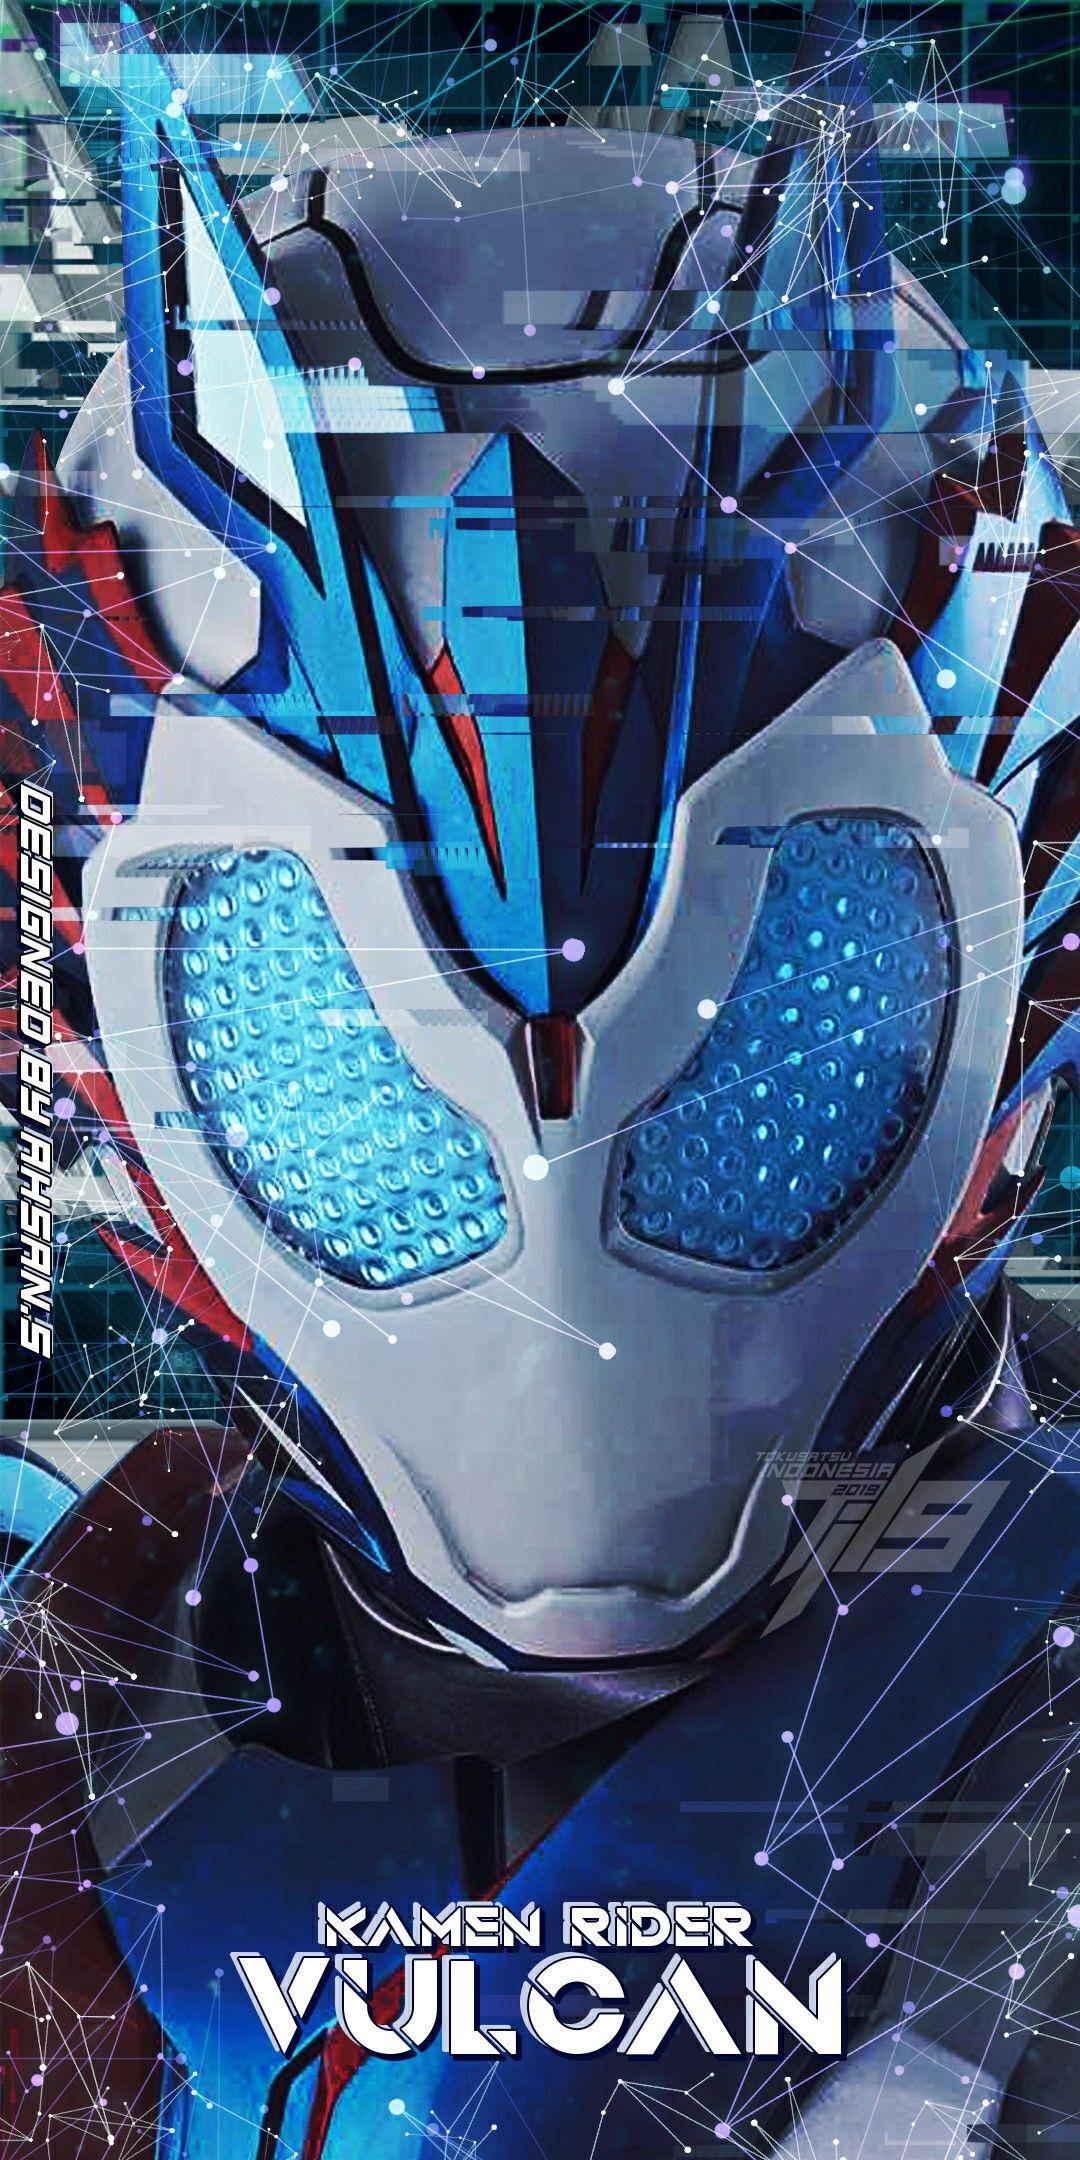 Wallpaper Kamen Rider Era Reiwa Name Kamen Rider Vulcan Tv